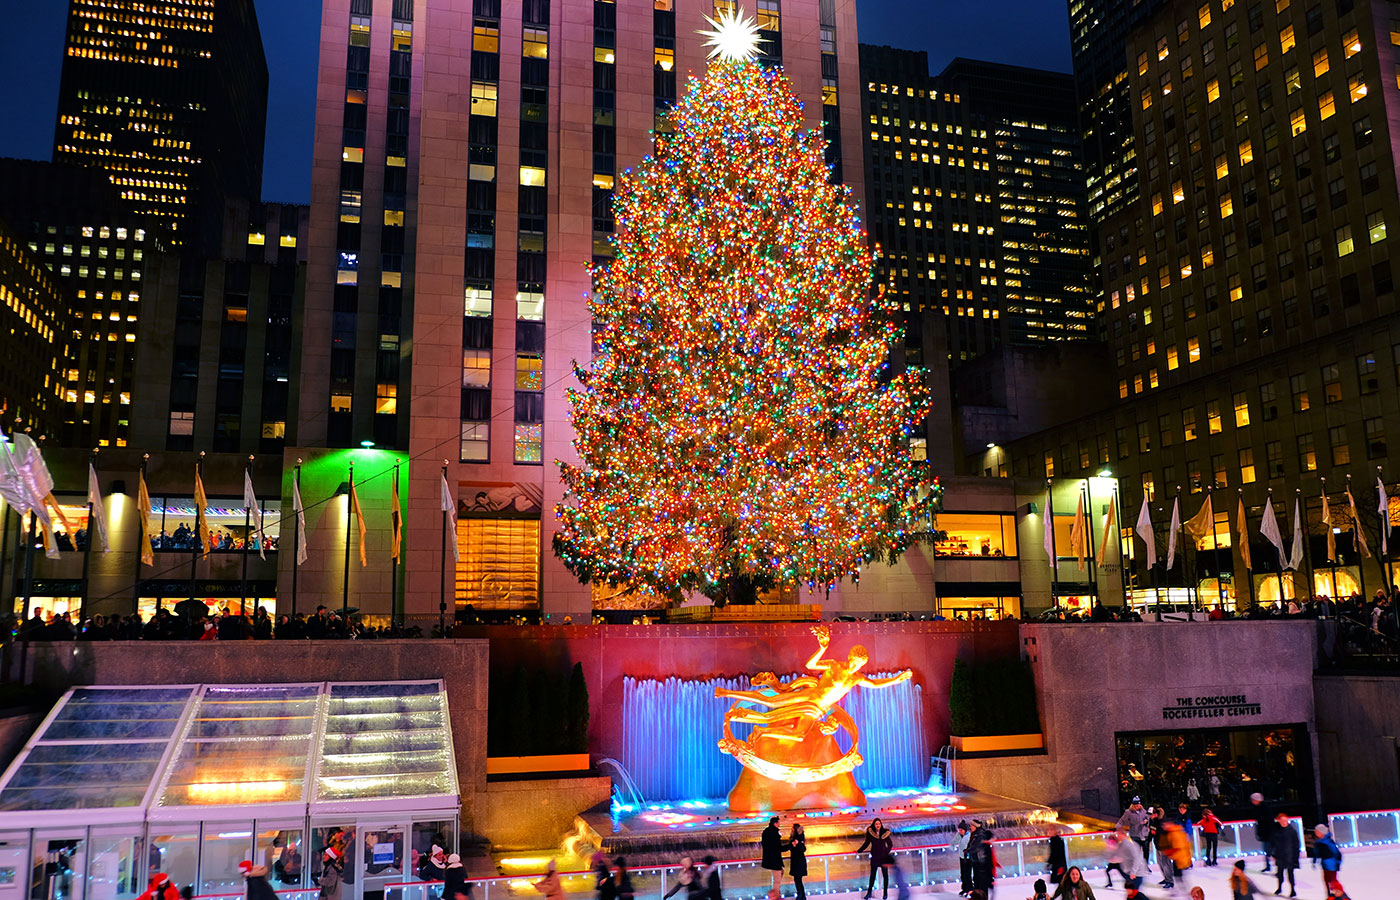 Juletid i New York - Juletræet ved Rockefeller Center